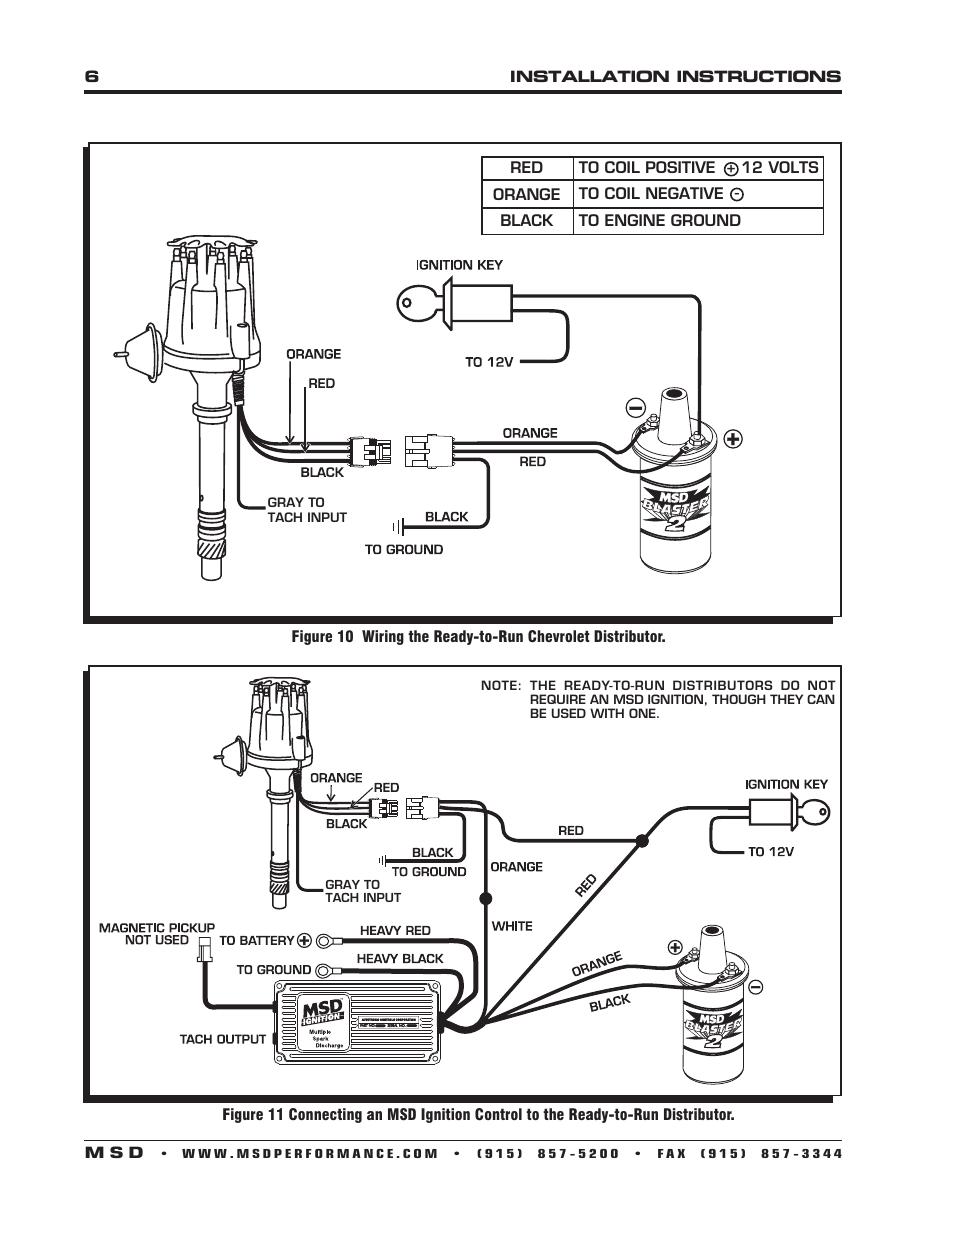 Diagram Msd 8360 Wiring Diagram Full Version Hd Quality Wiring Diagram Diagramofchart Radiotelegrafia It